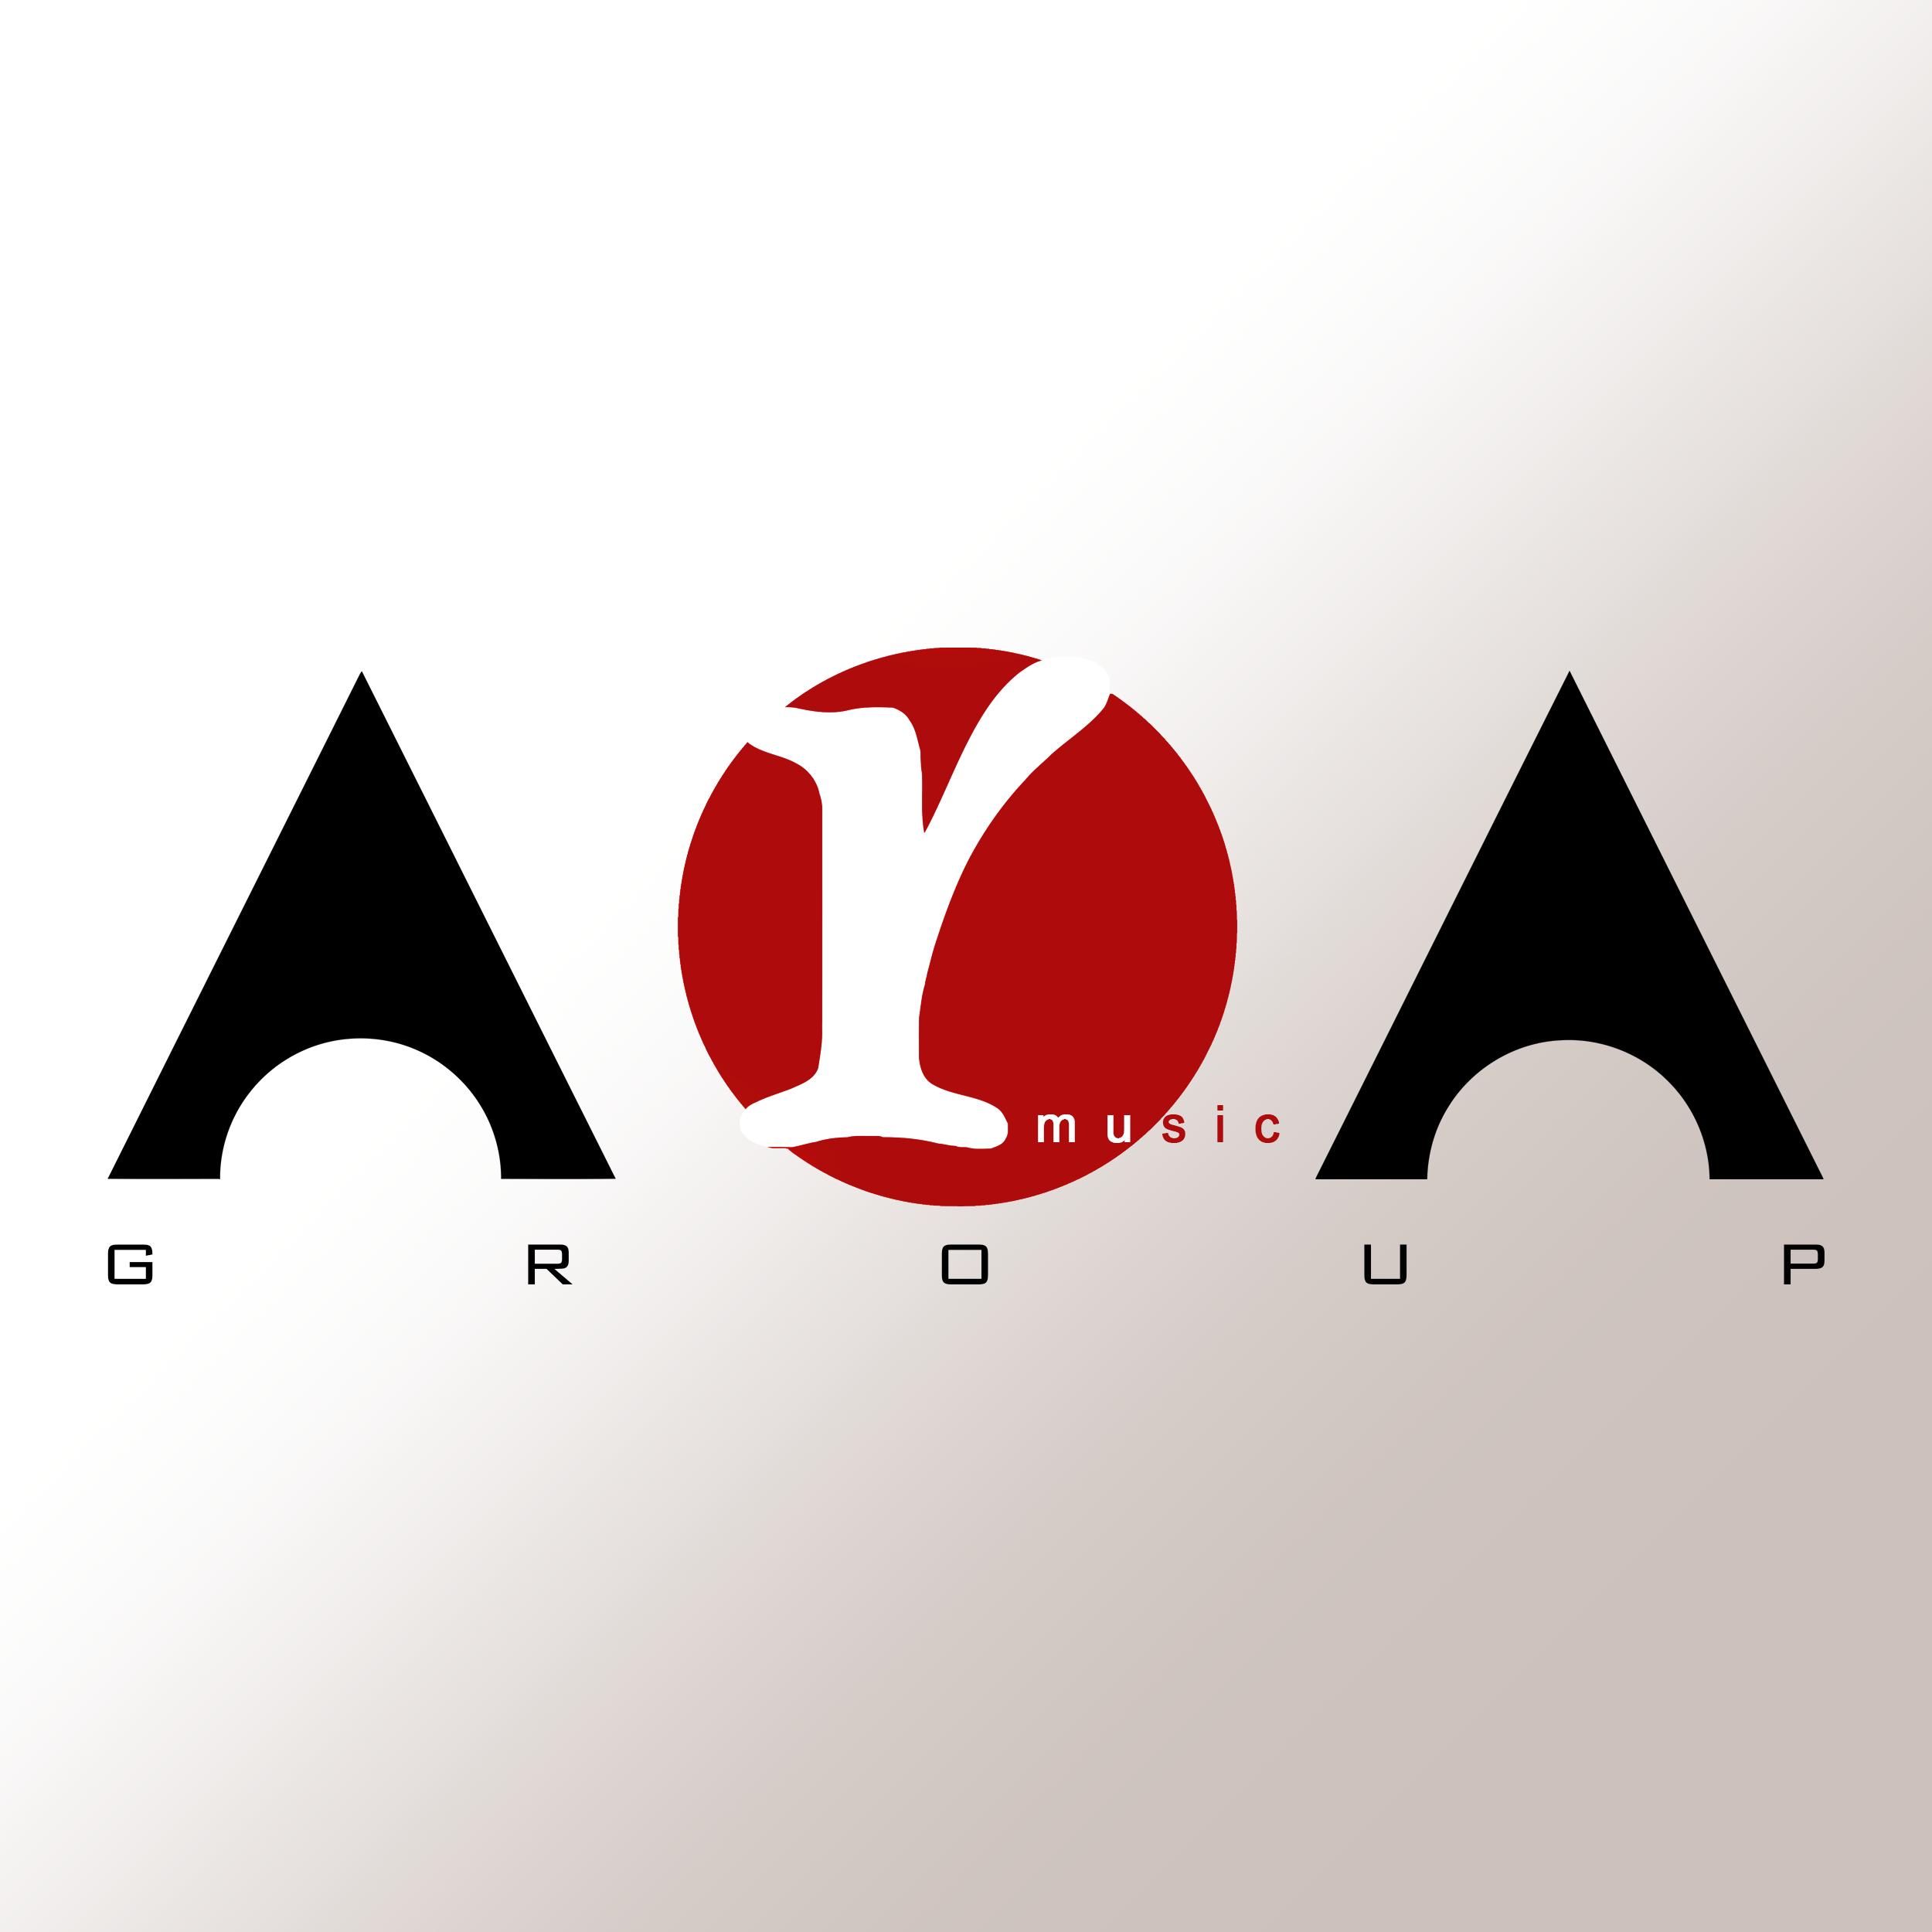 ara Design - London, United Kingdom | Facebook | 2500x2500